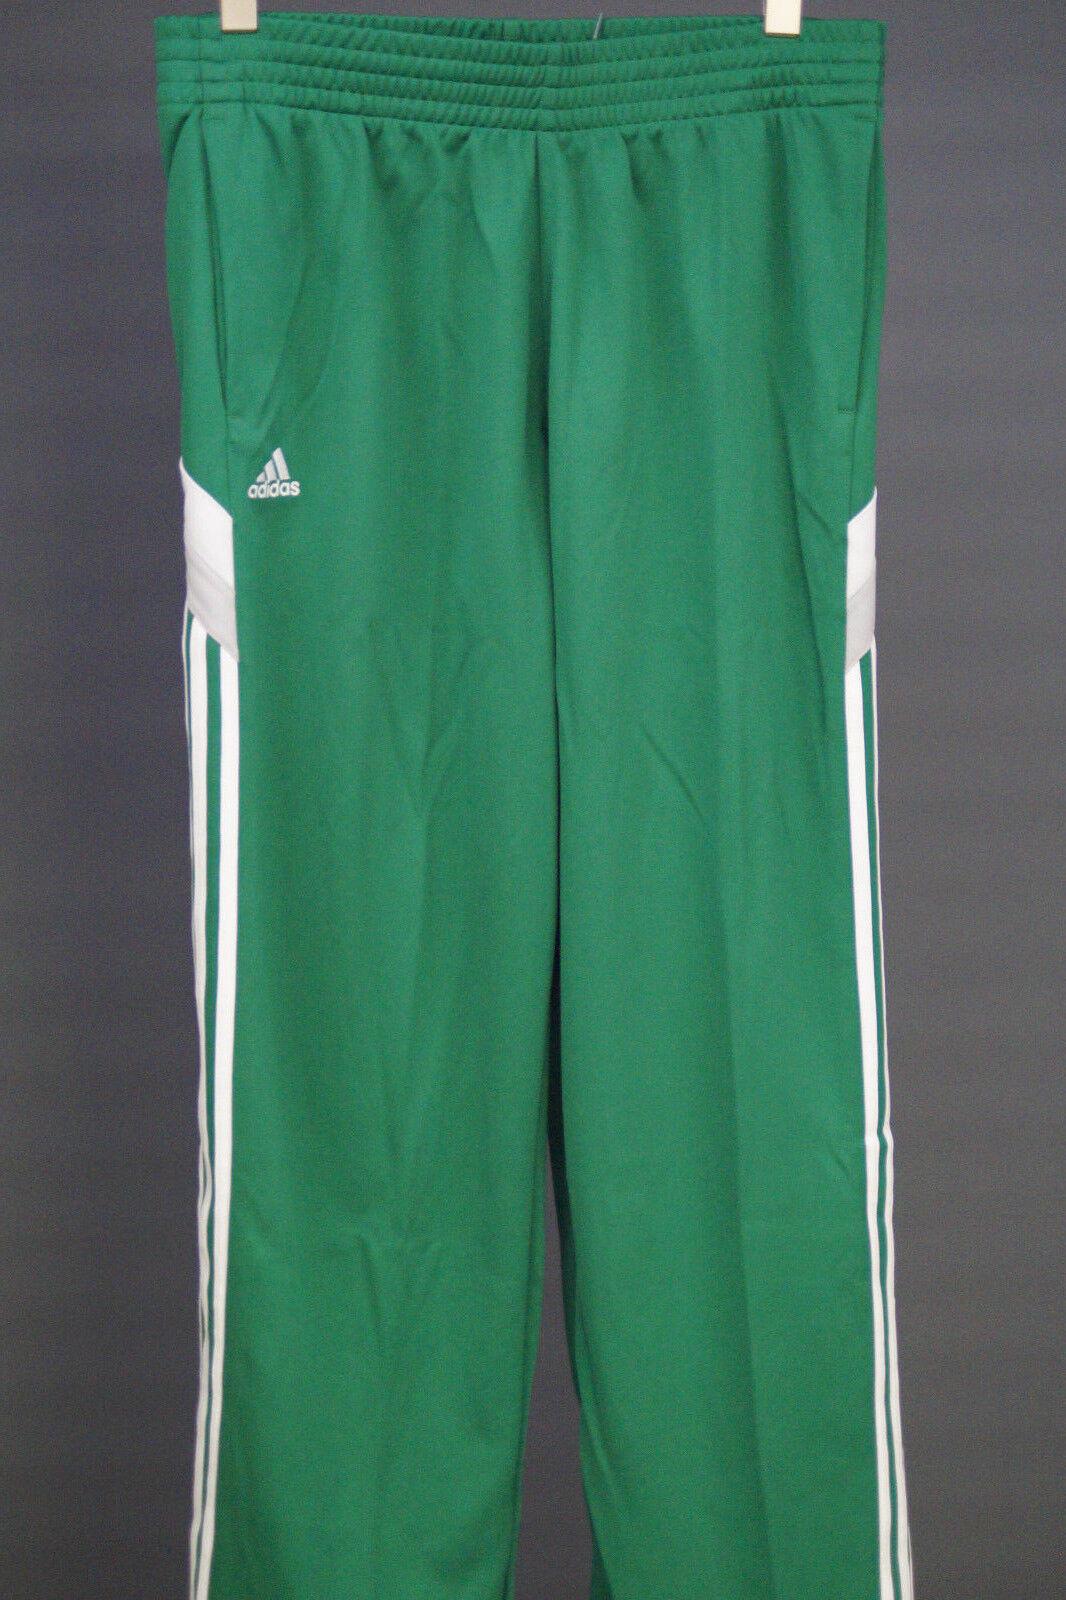 Adidas Command Pant green [S-4XLT] F93797 PANT Trainingshose Sporthose Basketball